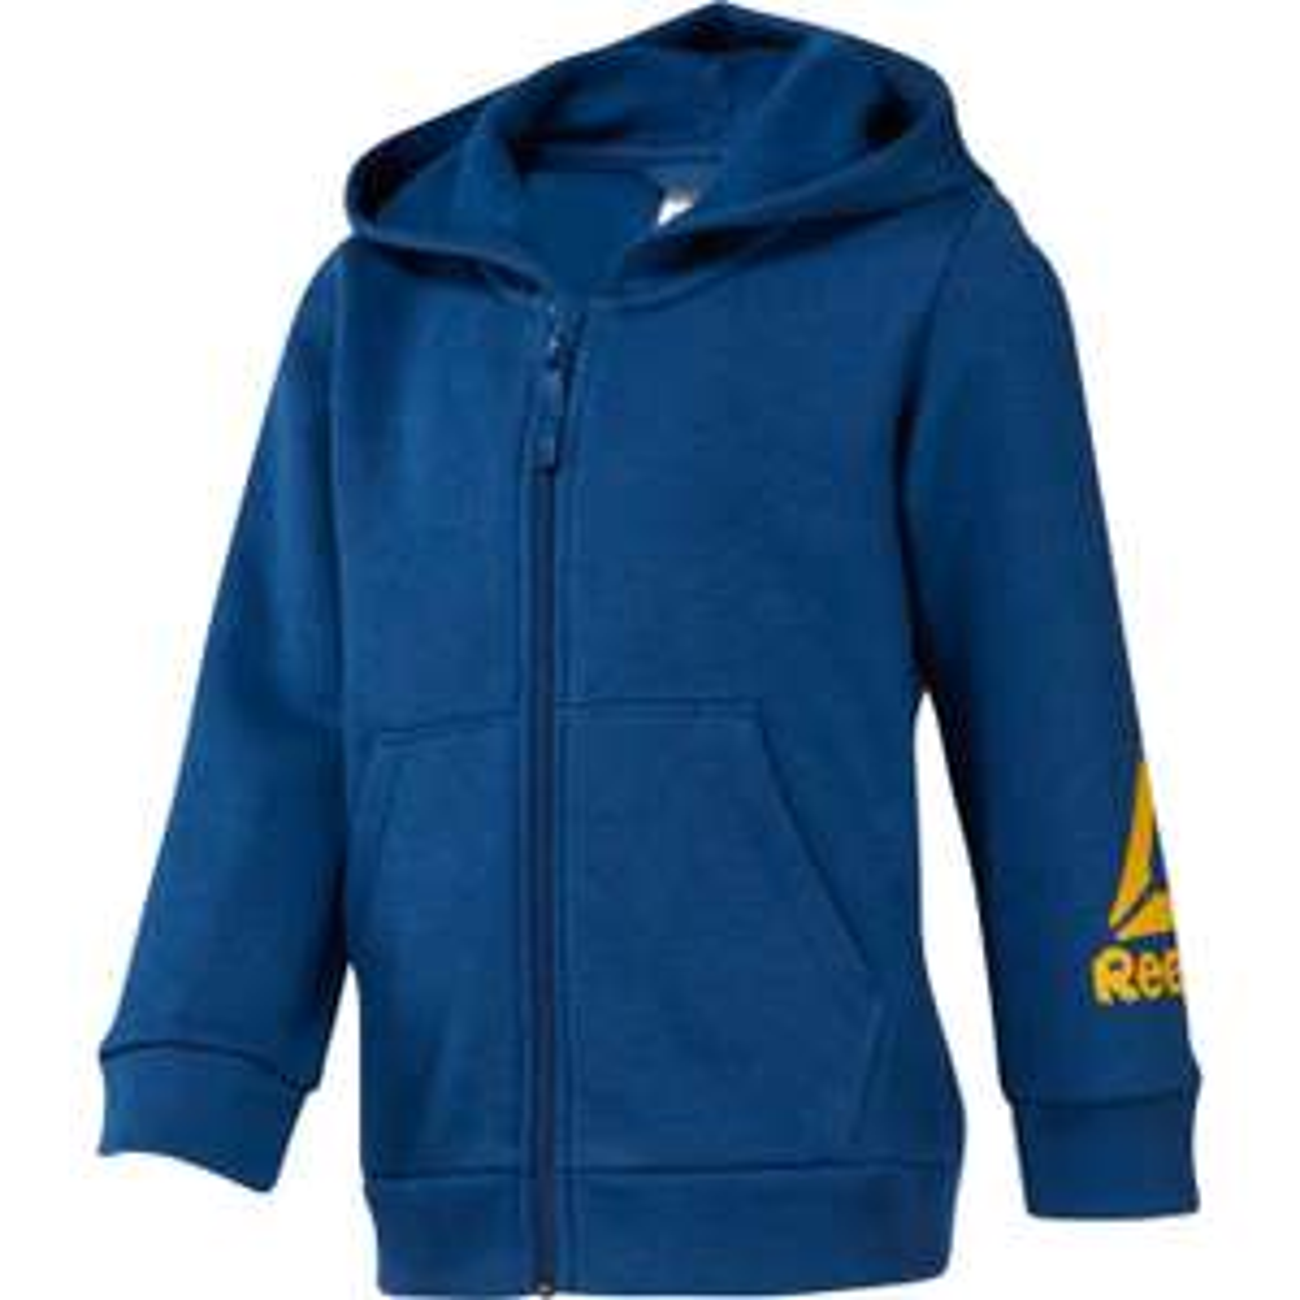 Sweat-shirt Reebok Elem FZ Fleece - bleu, du 6 au 14 ans (via retrait en magasin)